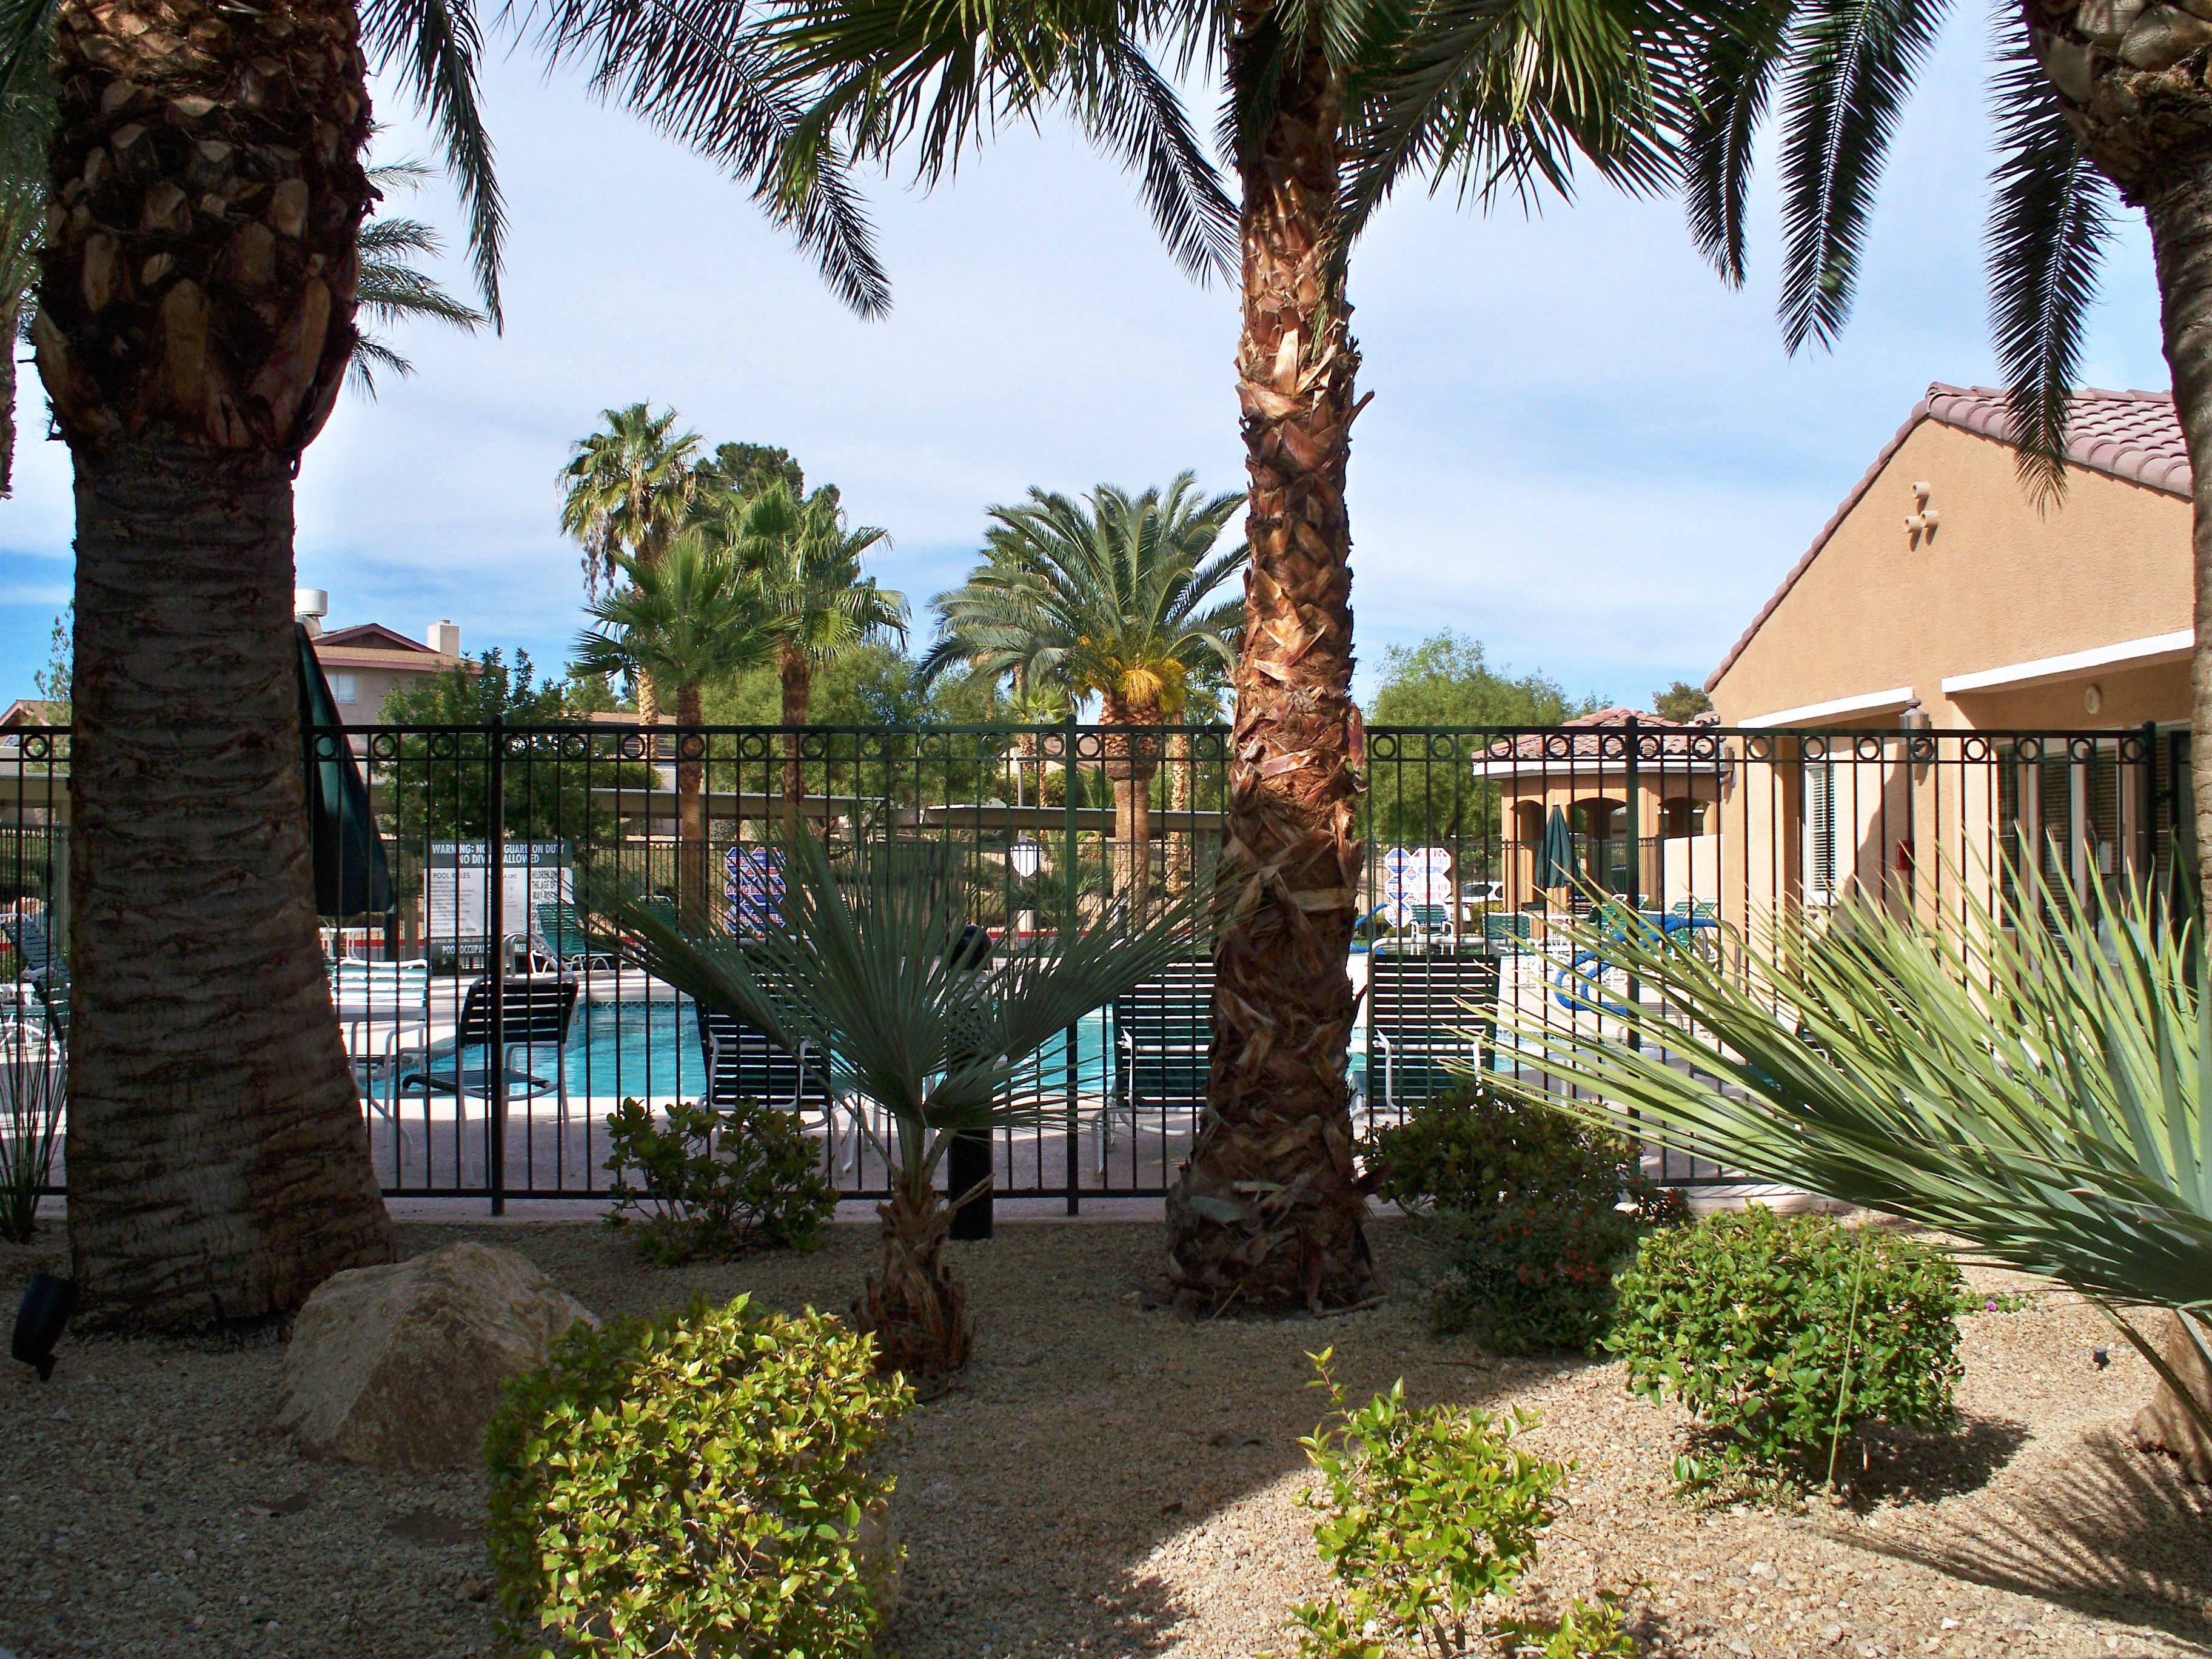 Vintage Desert Rose Senior Apartments 1701 N Jones Blvd Las Vegas Nv 89108 Usdoh Org